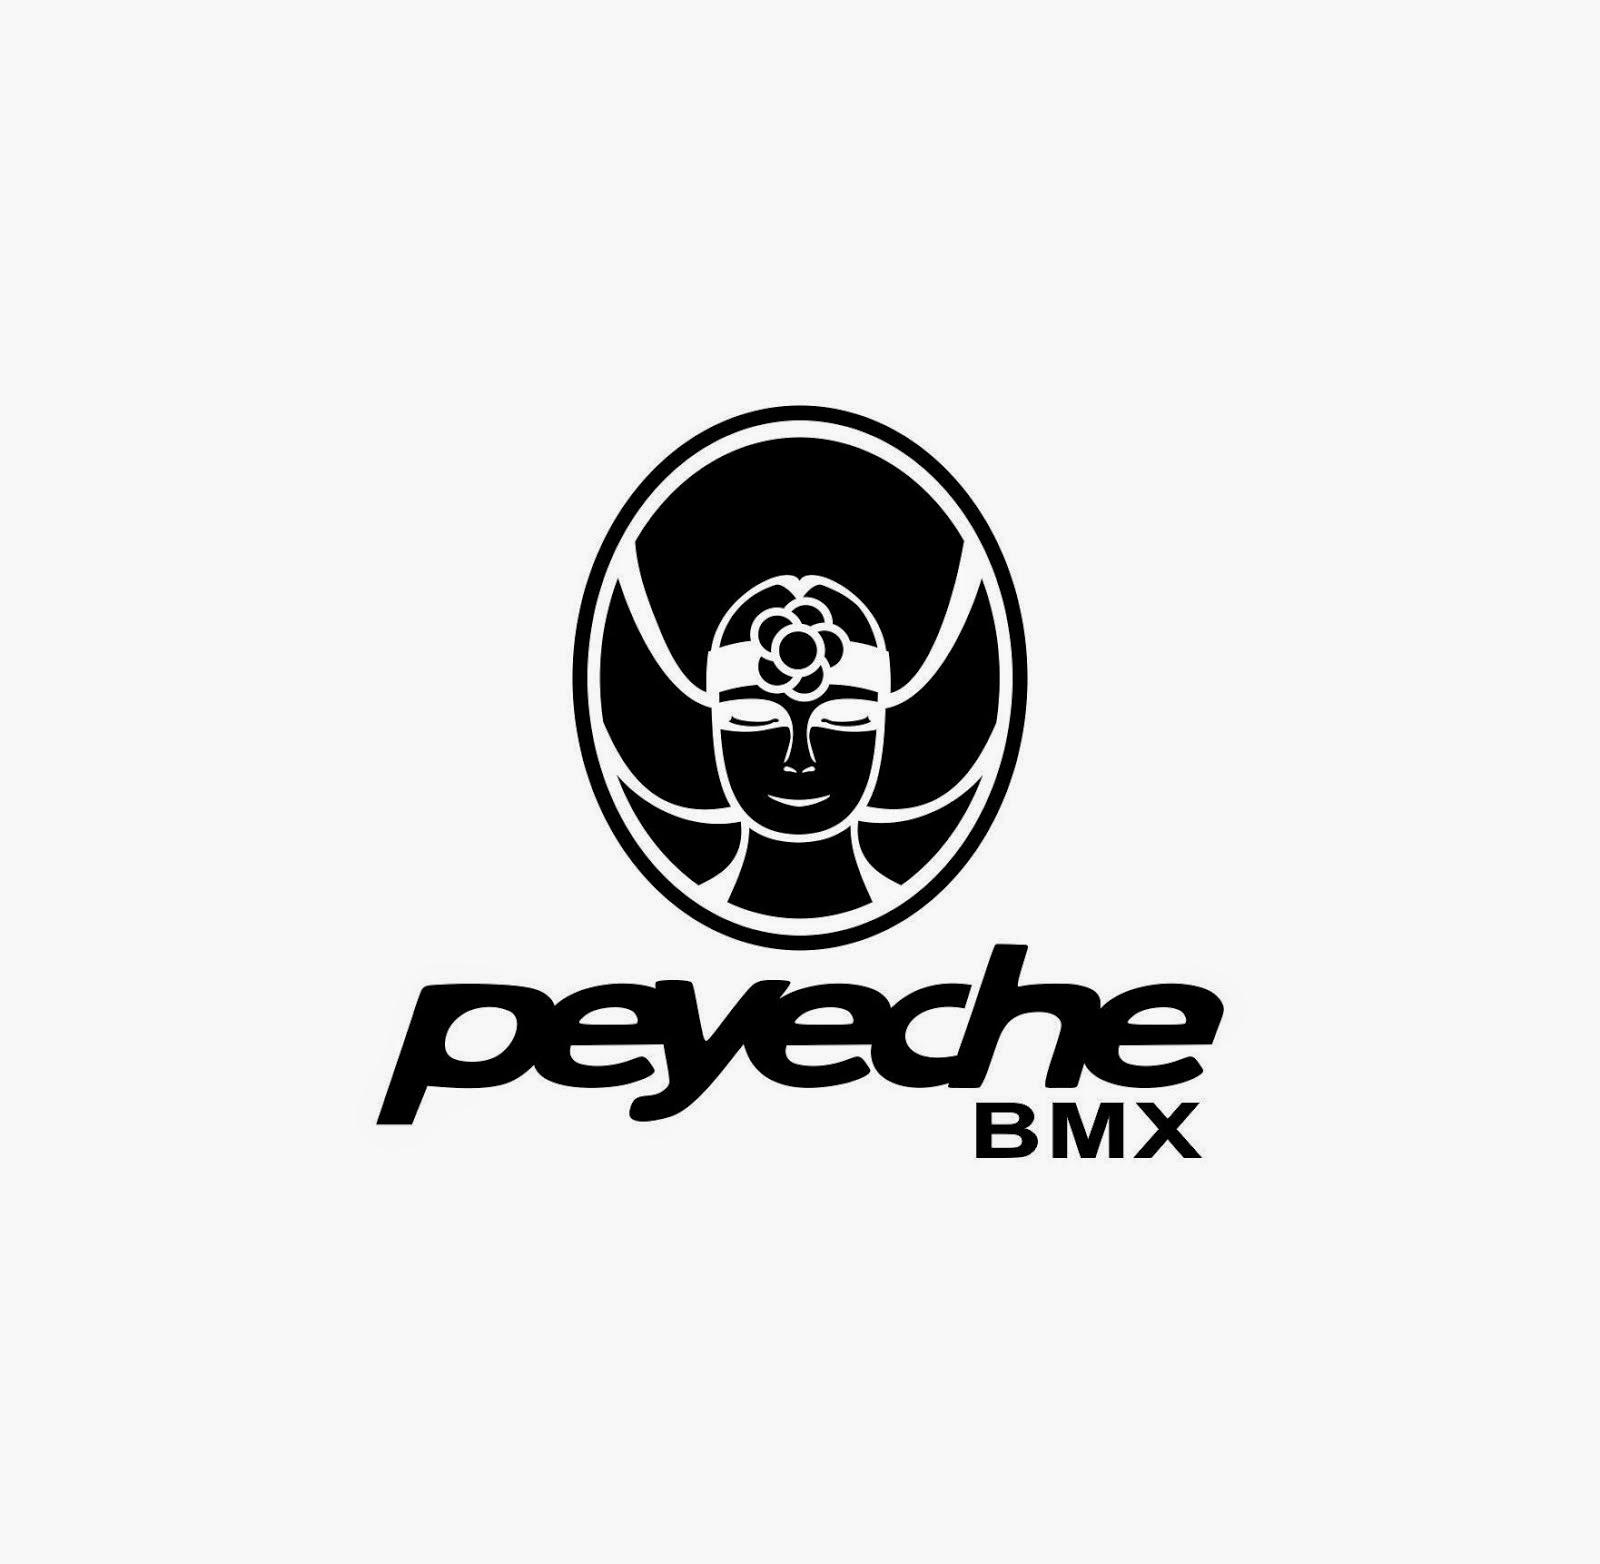 Bicicletas Peyeche